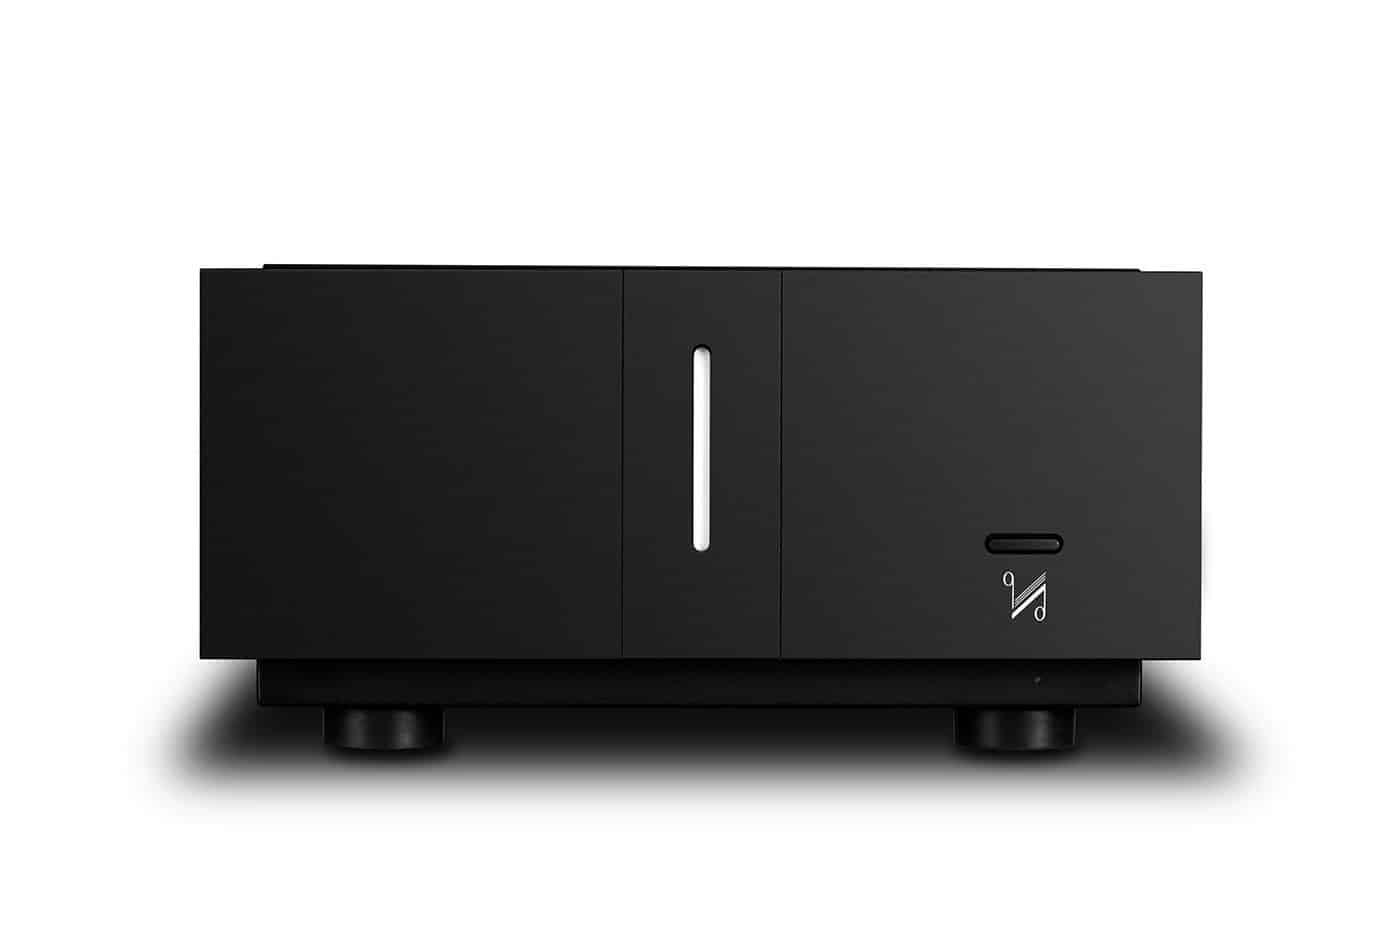 Quad Artera Stereo Current Dumping Power Amplifier Black